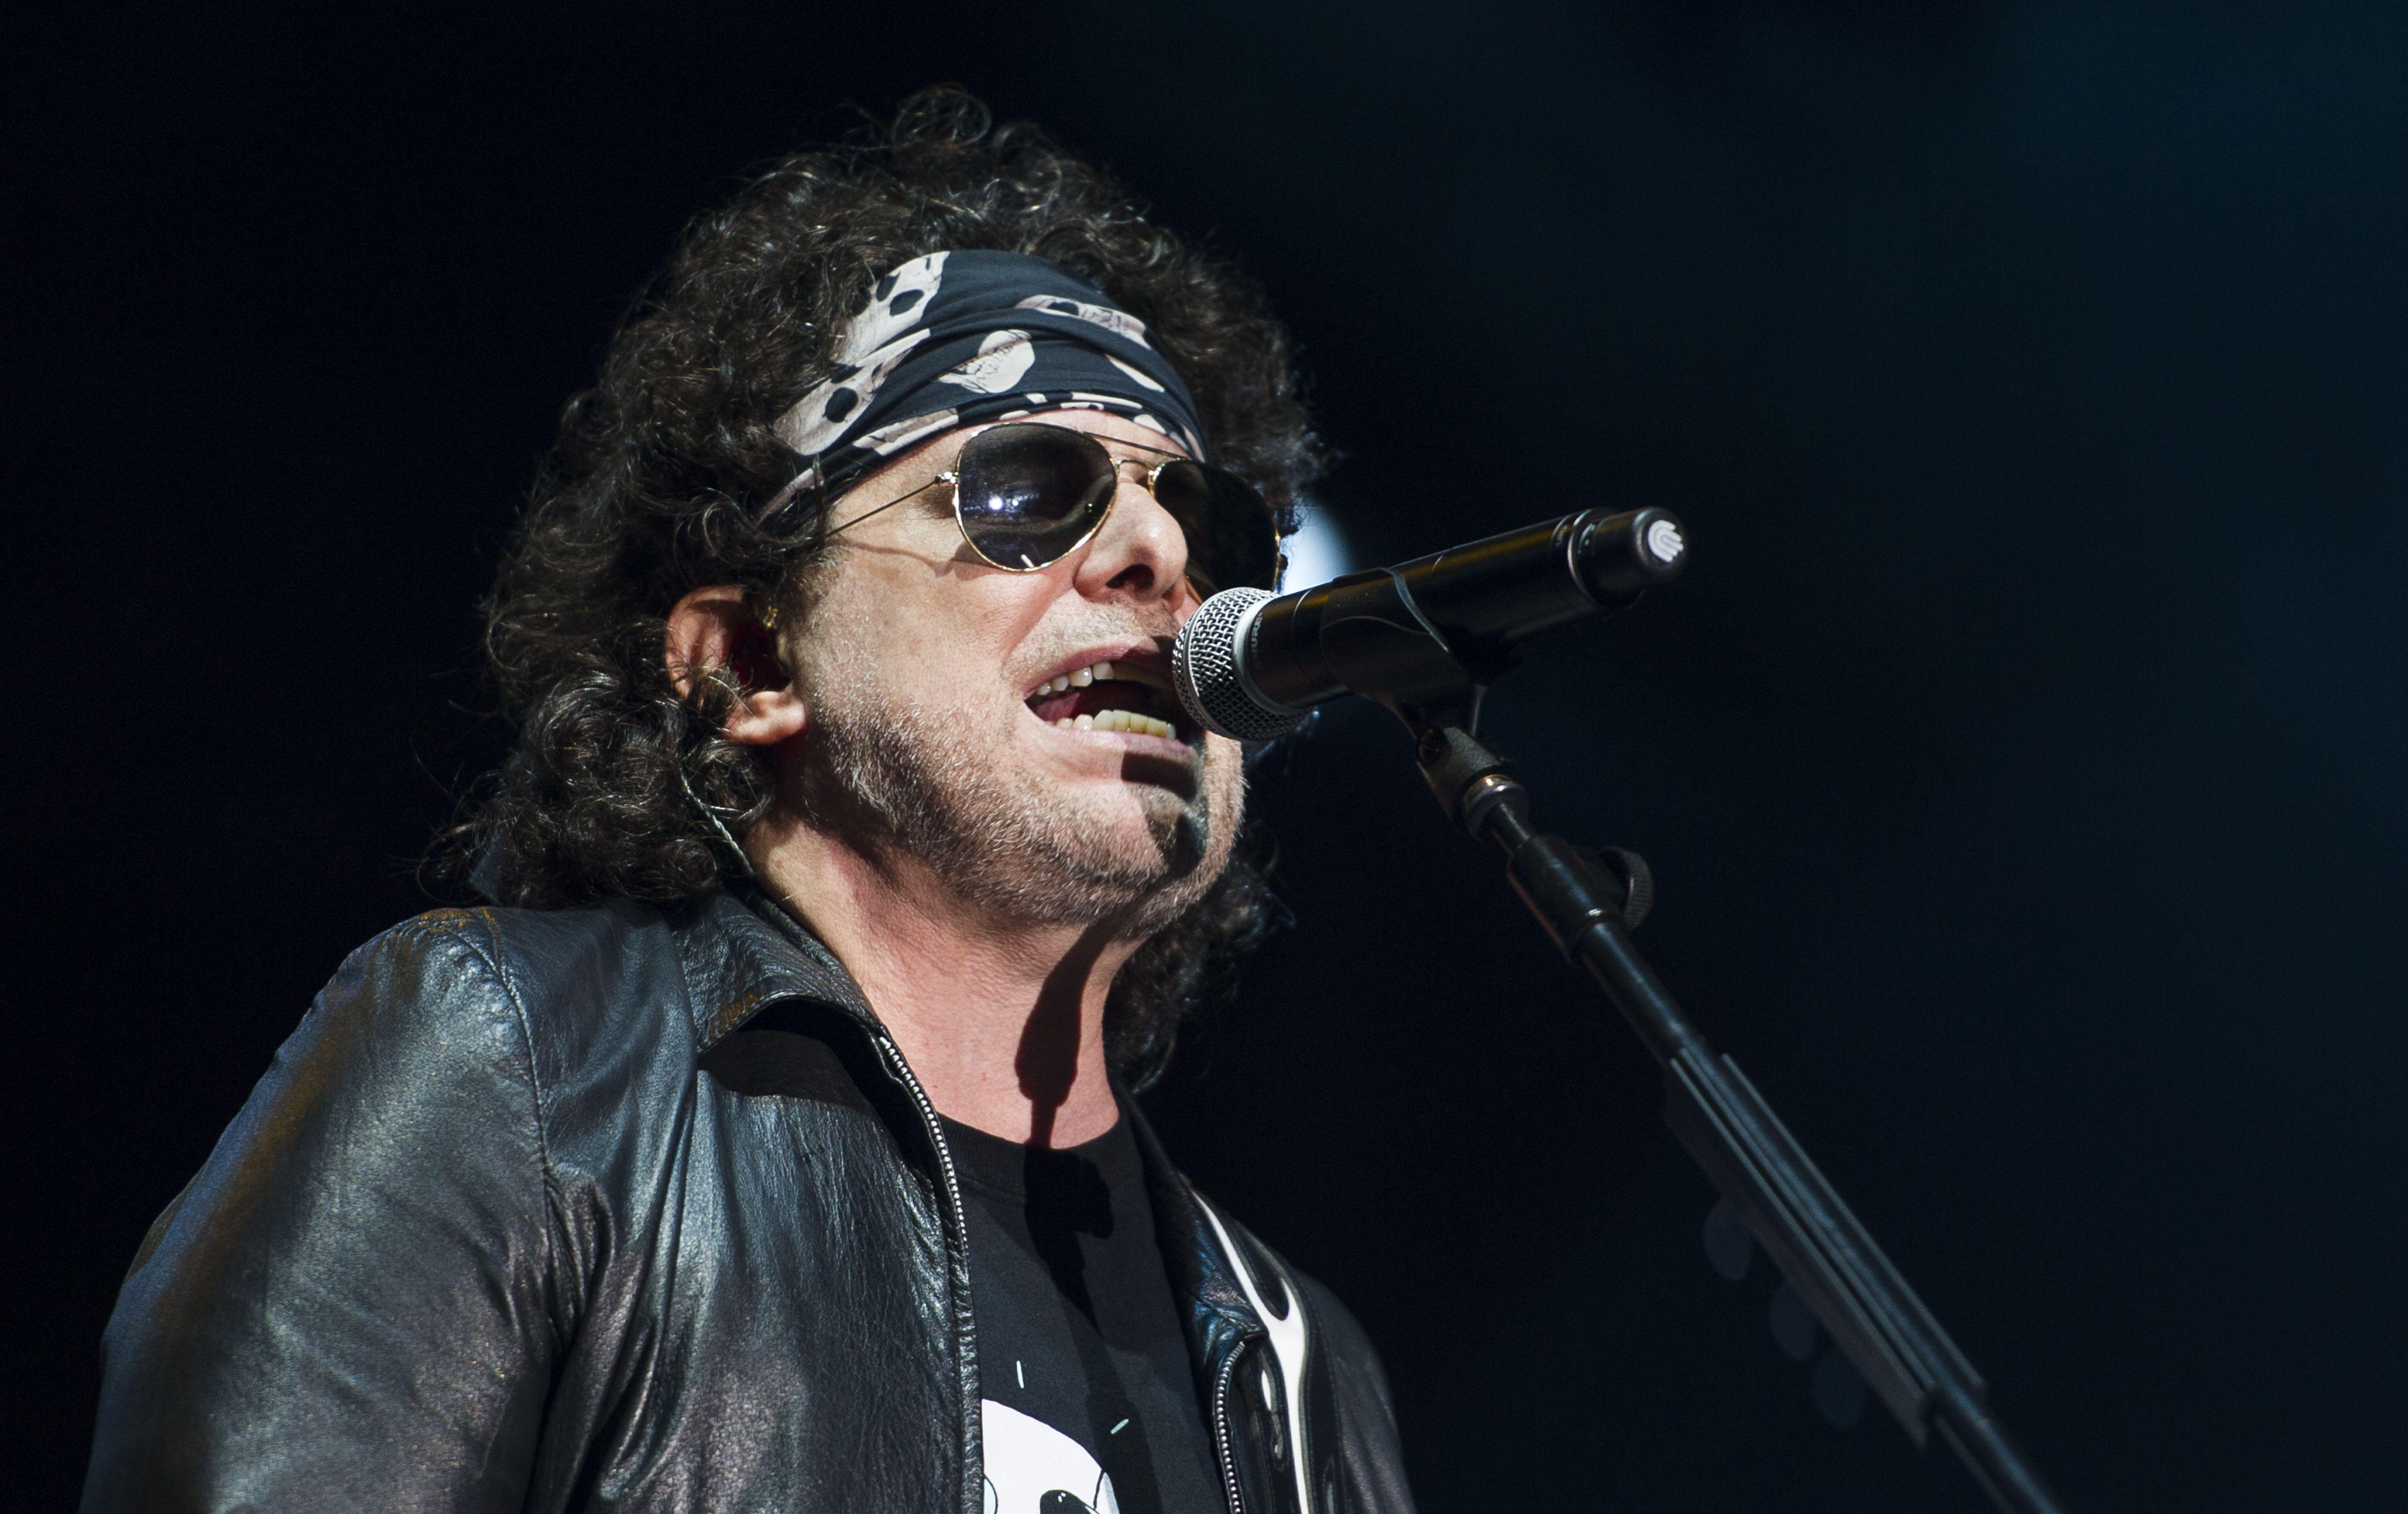 Latin rock star Andres Calamaro